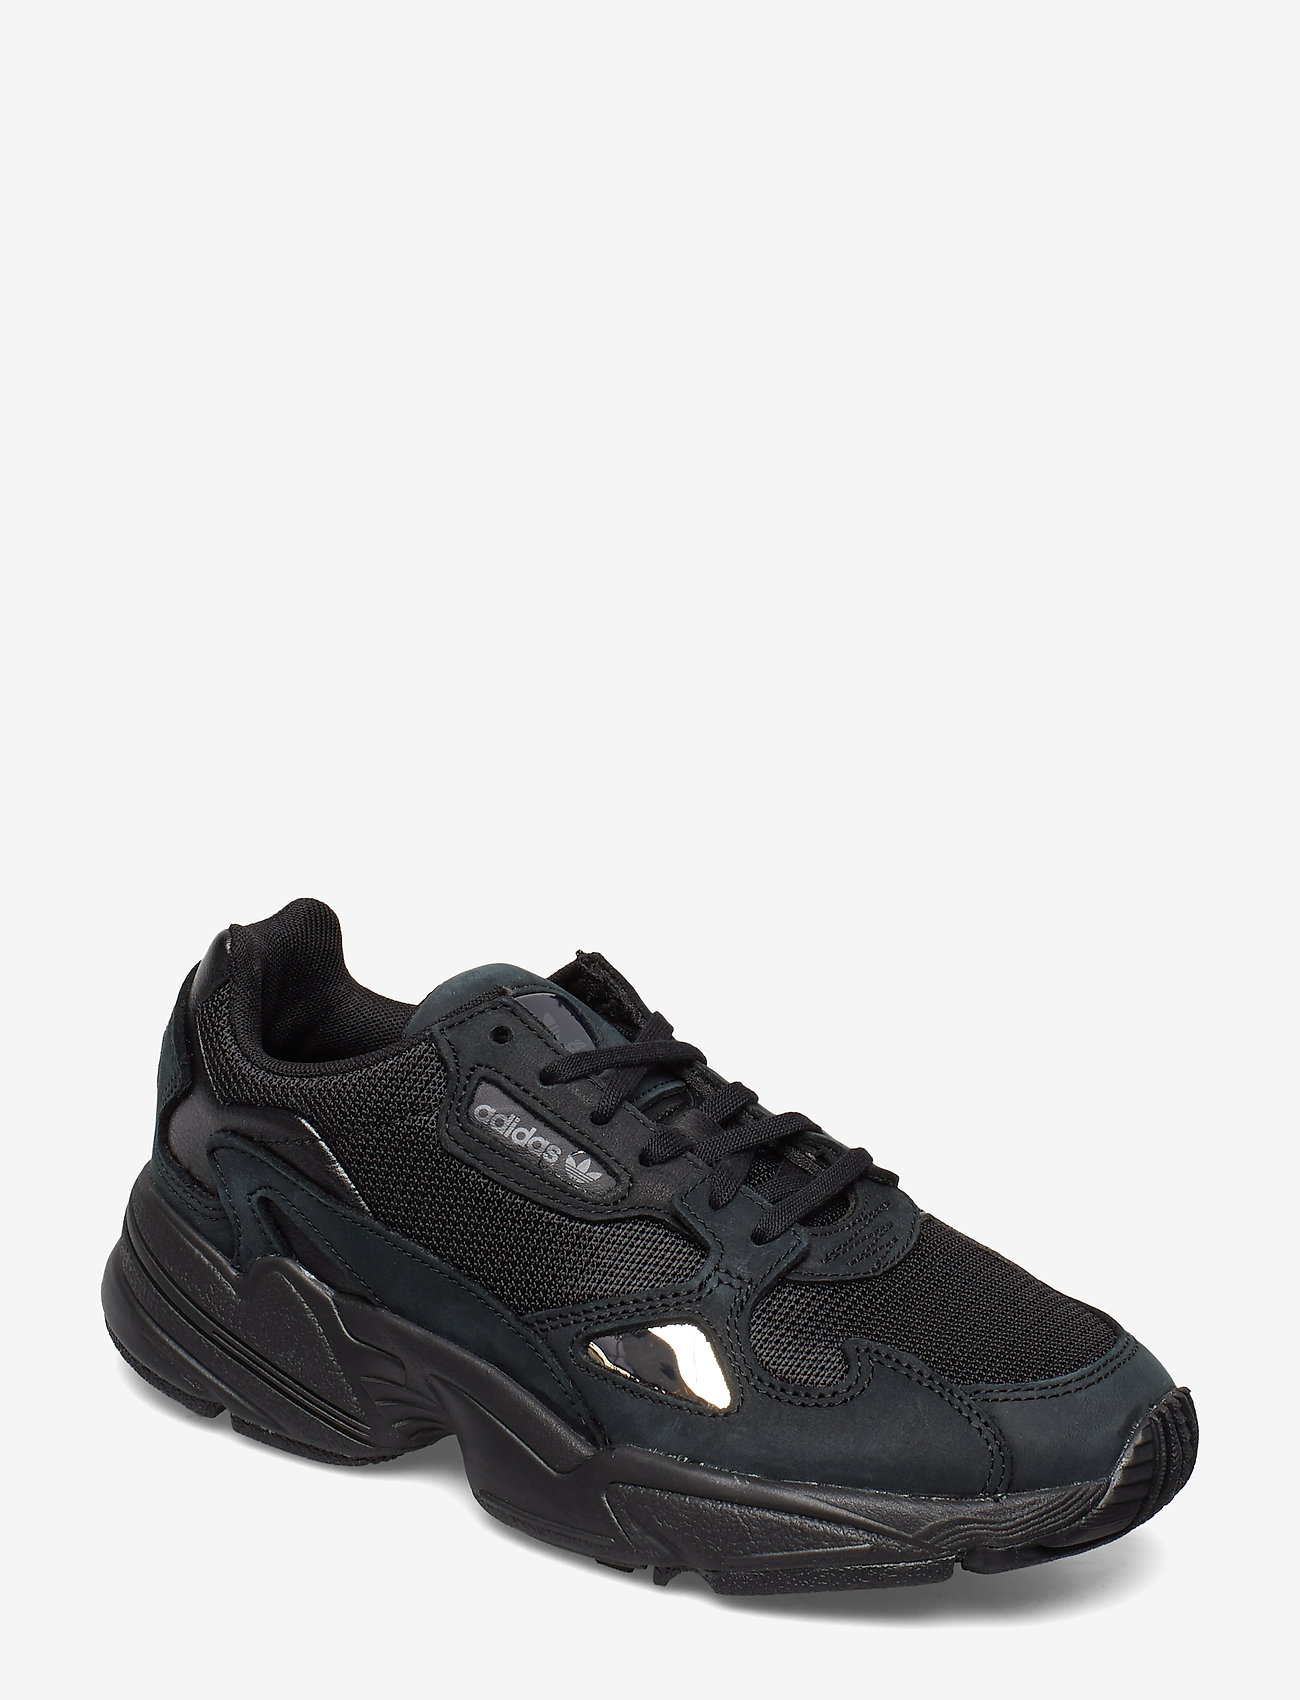 adidas Originals - FALCON W - chunky sneakers - cblack/cblack/grefiv - 0